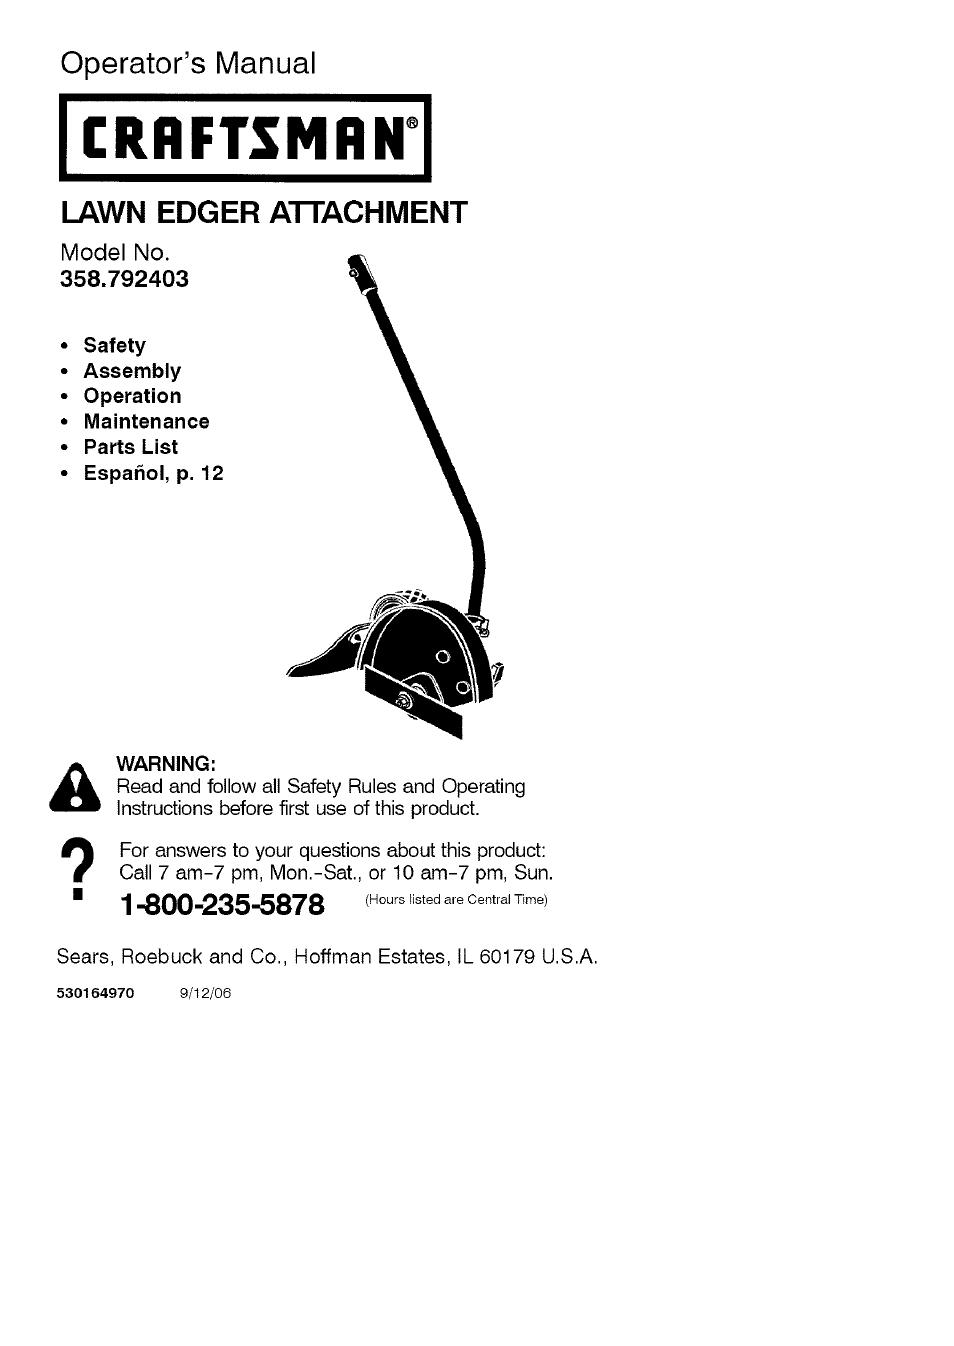 craftsman 358 792403 user manual 21 pages rh manualsdir com Craftsman Weed Wacker Attachments Craftsman Edger Attachment Parts